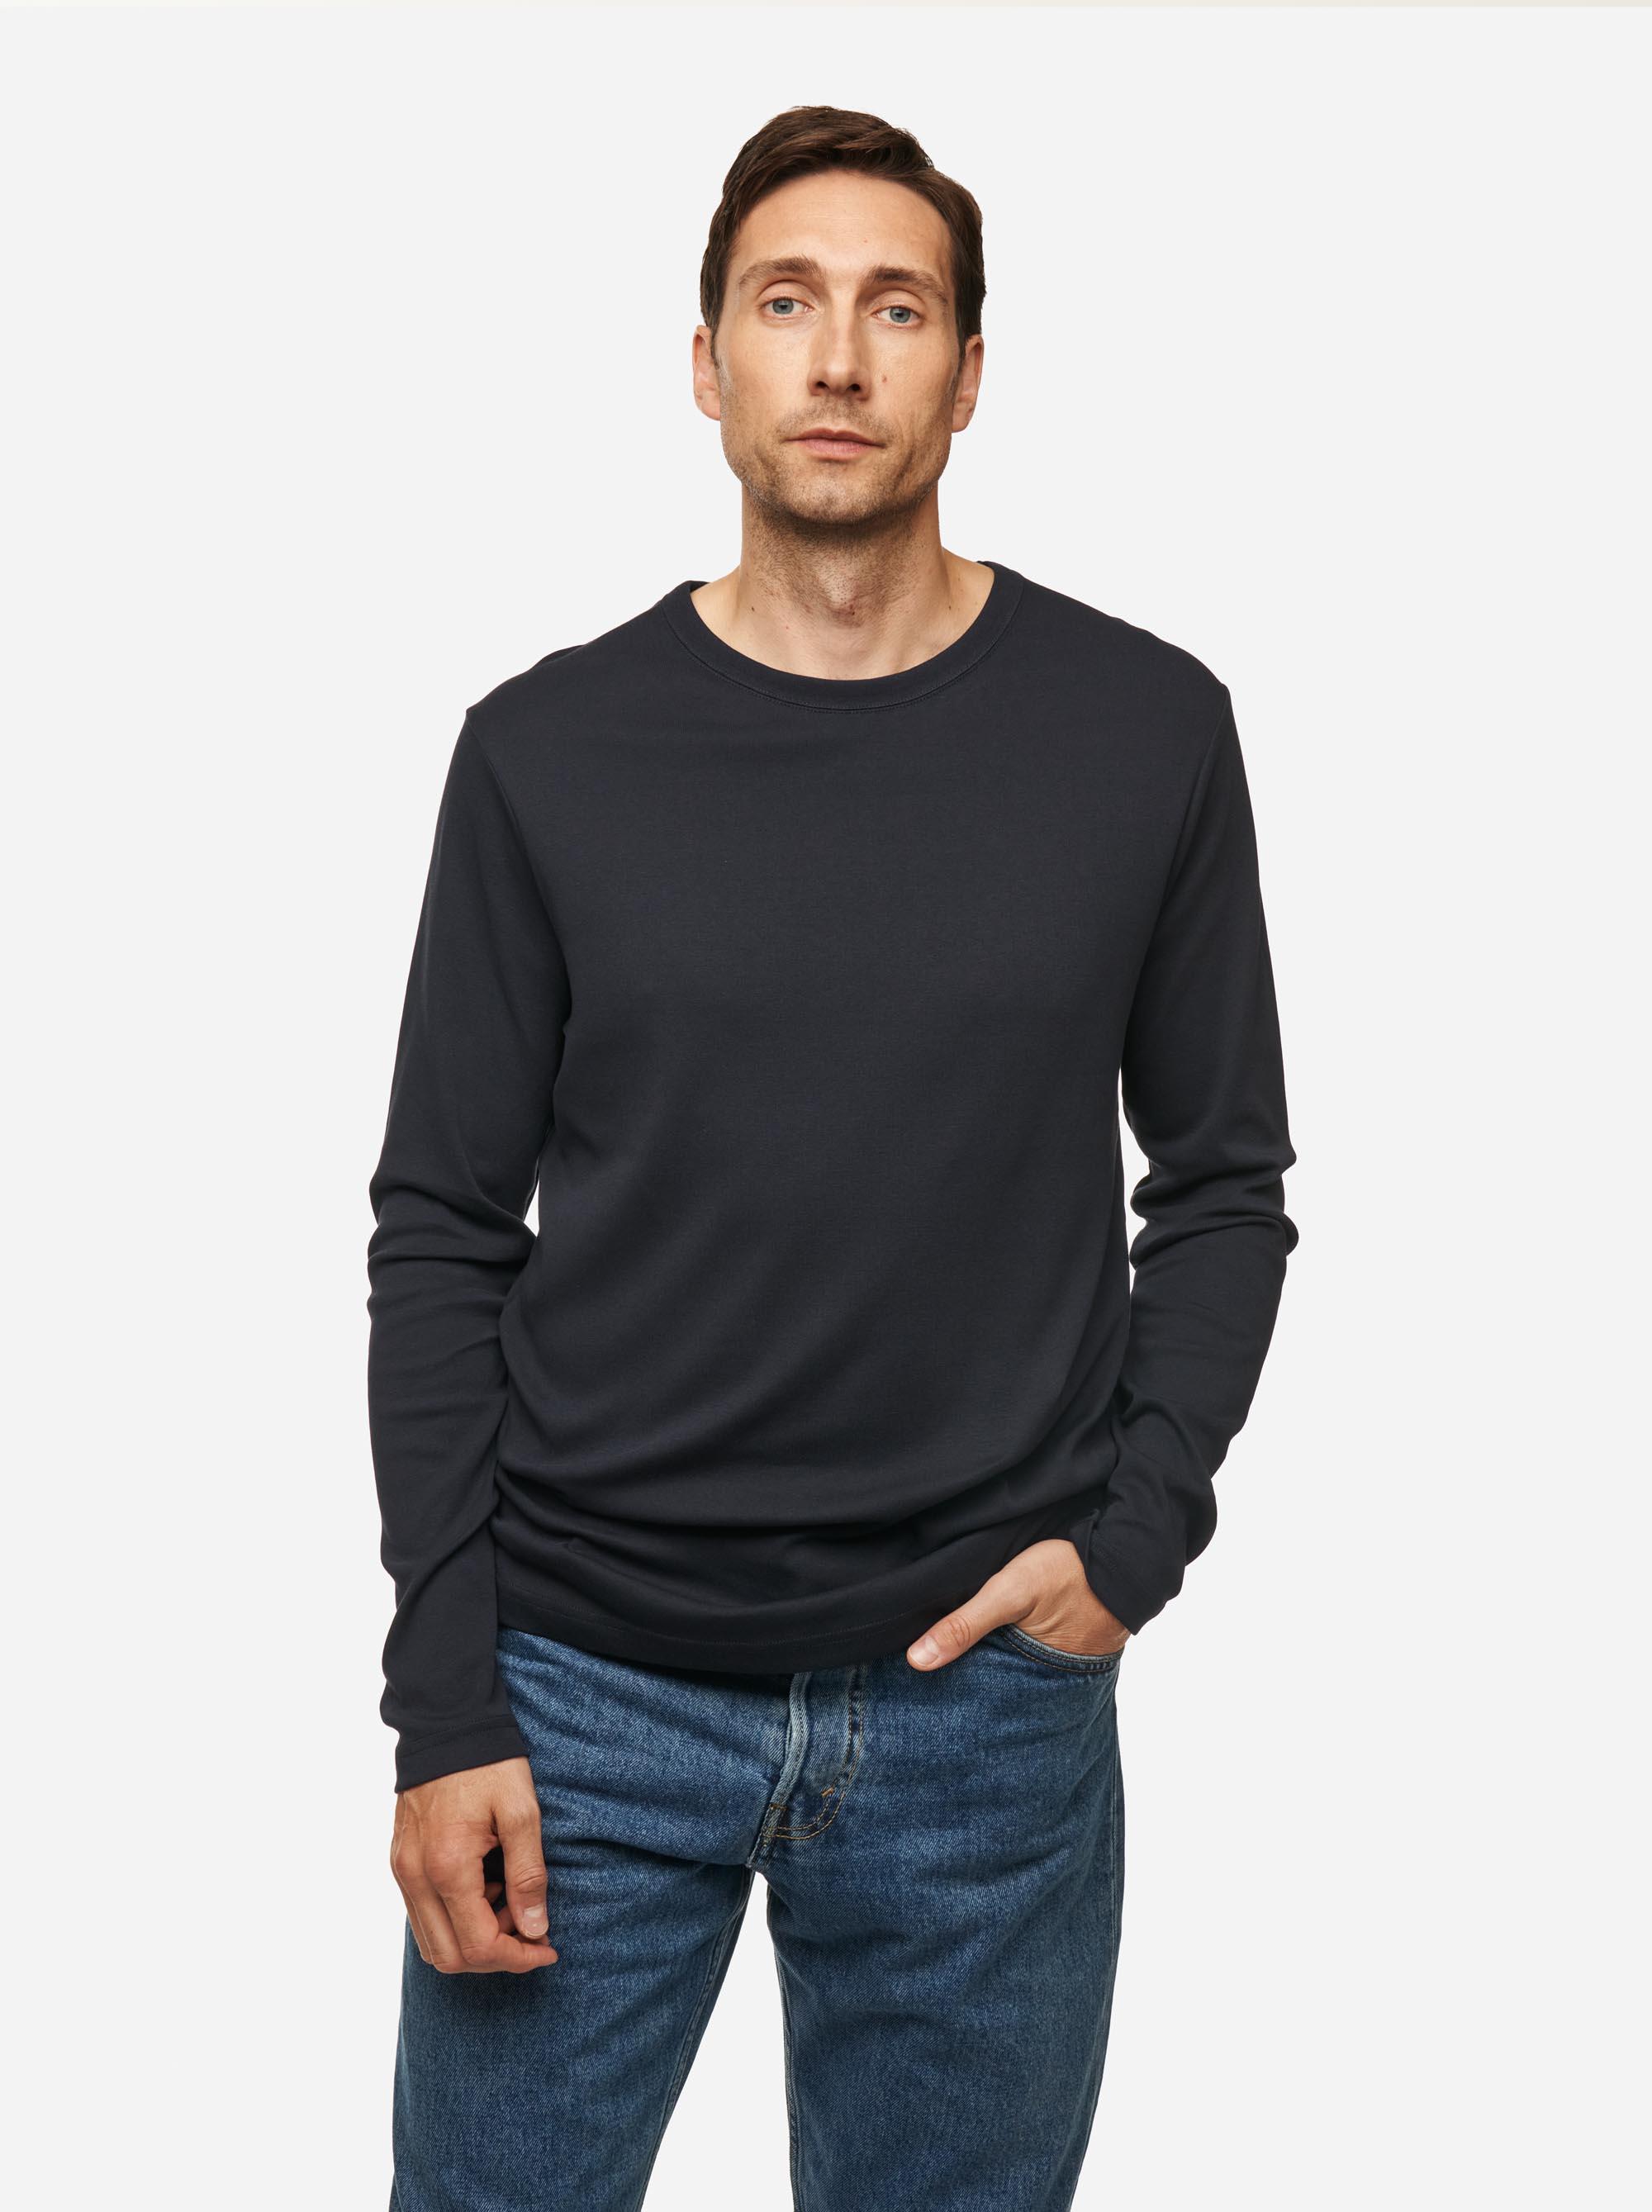 Teym - The-T-Shirt - Longsleeve - Men - Blue - 2